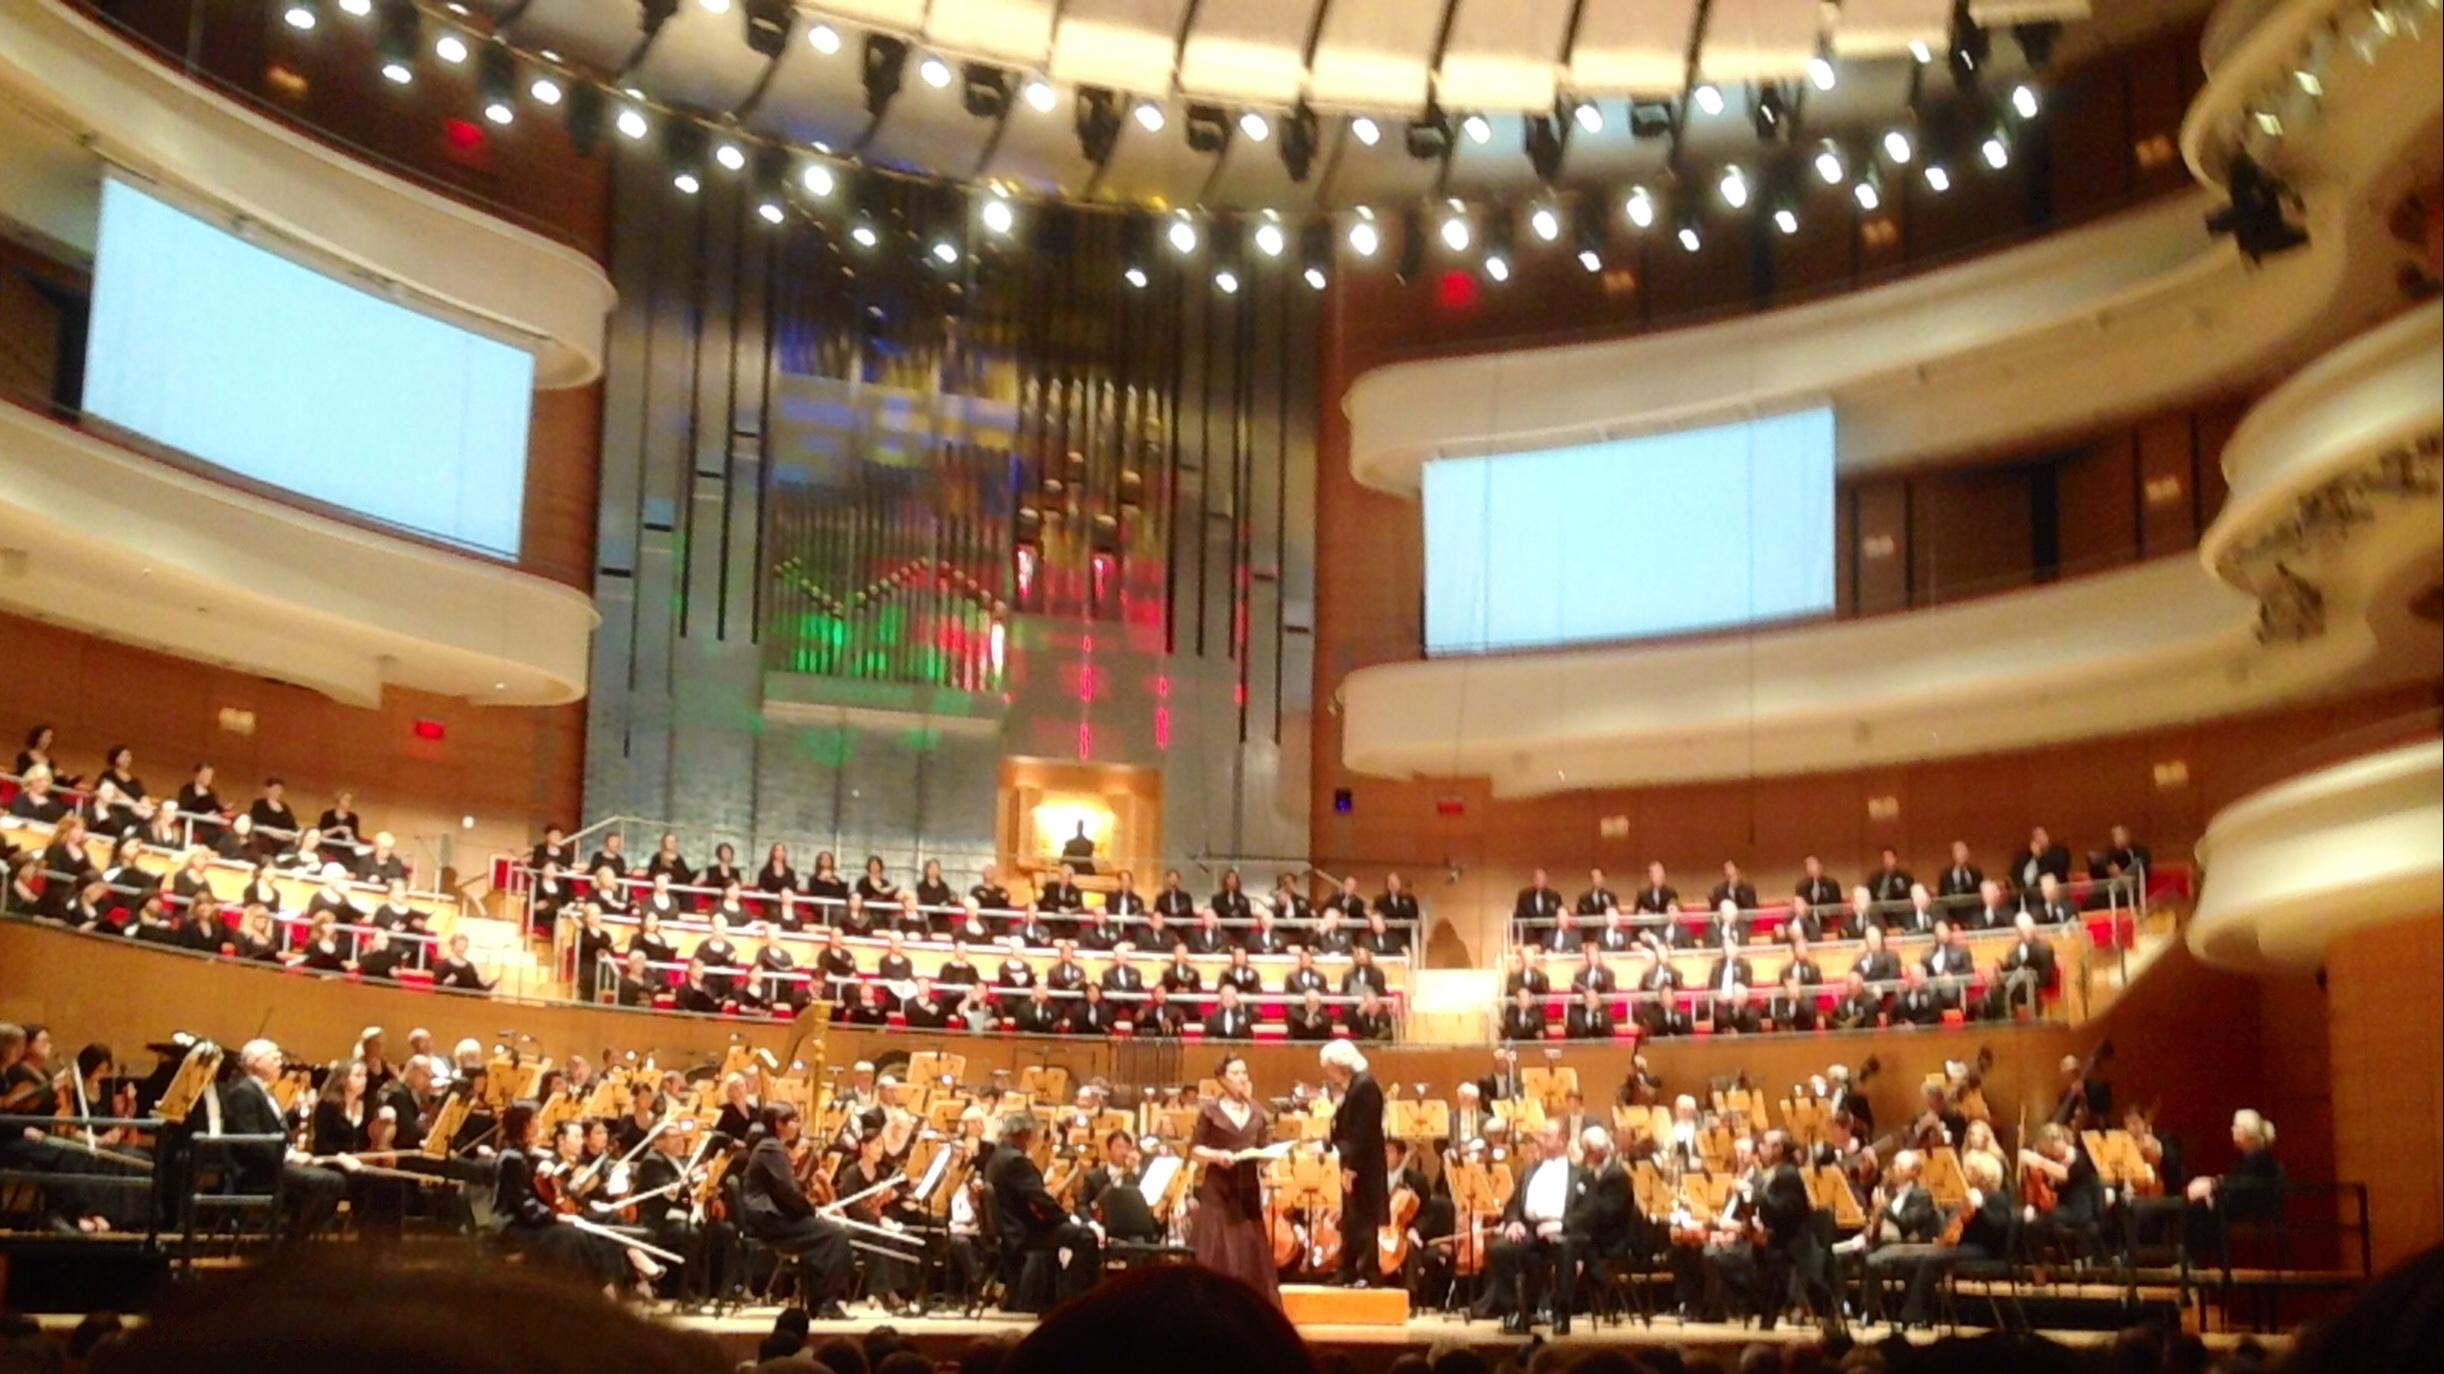 Mezzo soloist in the Duruflé  Requiem  with Pacific Symphony, Segerstrom Hall